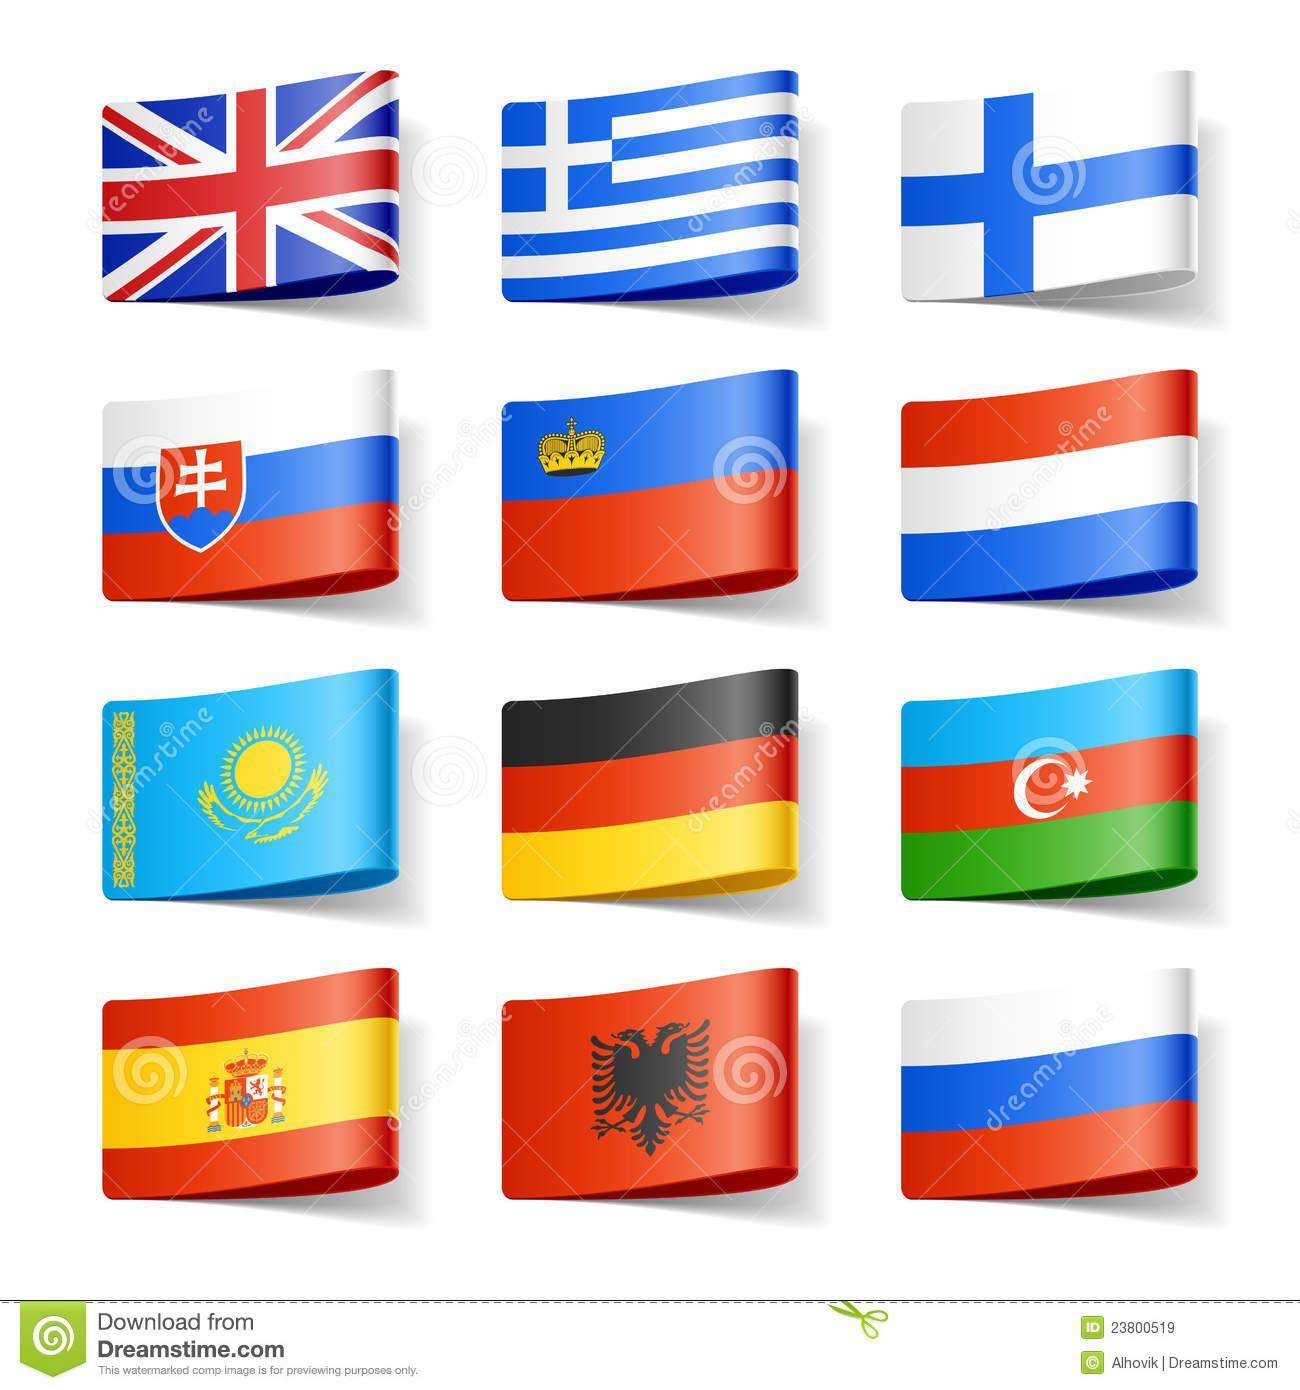 Download World Flags Europe Cartoon Vector via